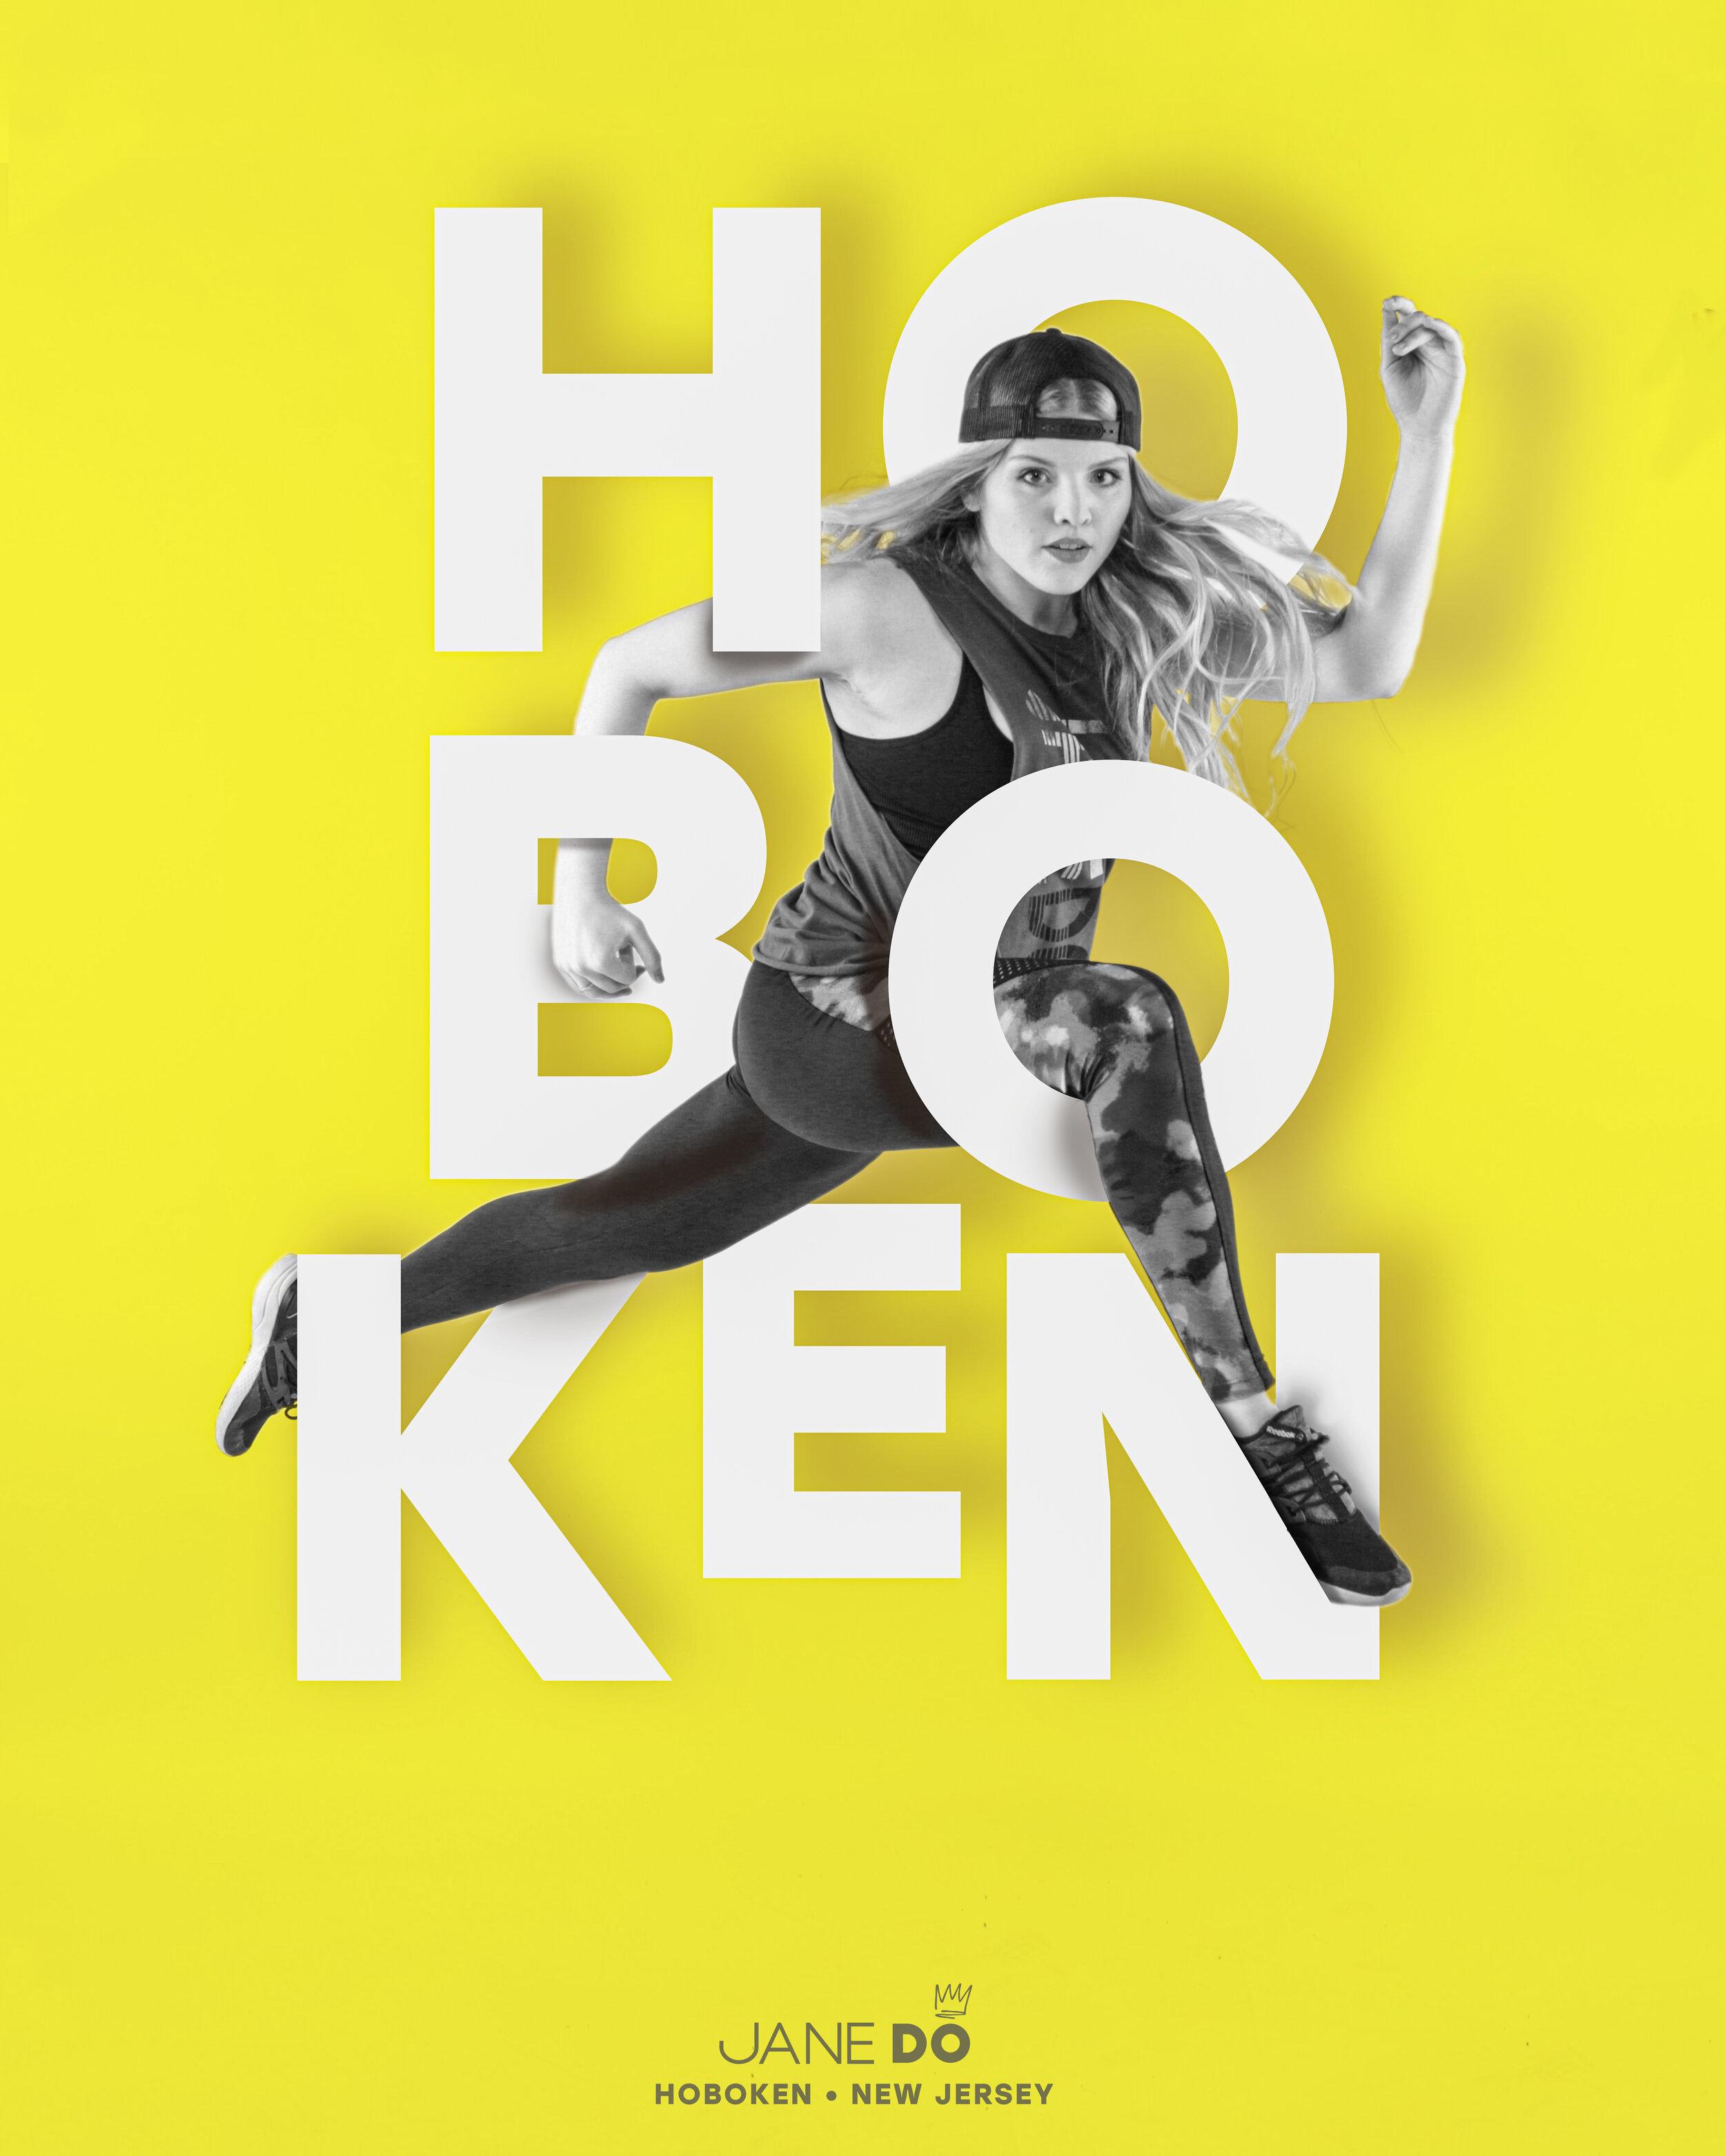 Hoboken_Taylor (1).jpg